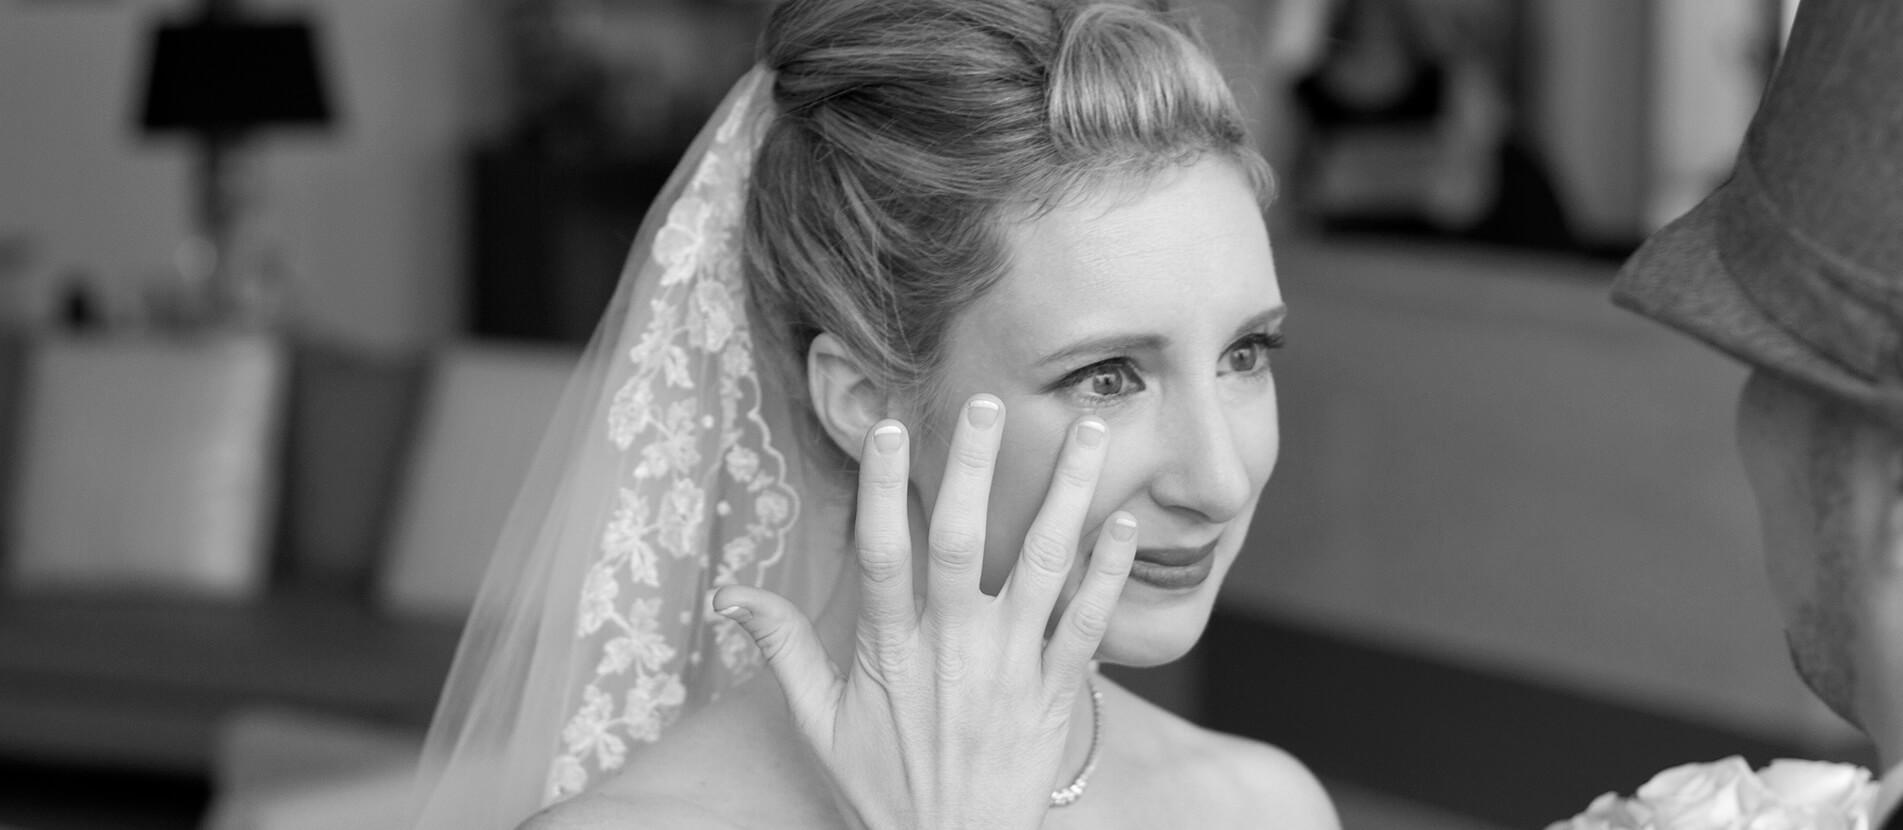 Amanda-tears-1